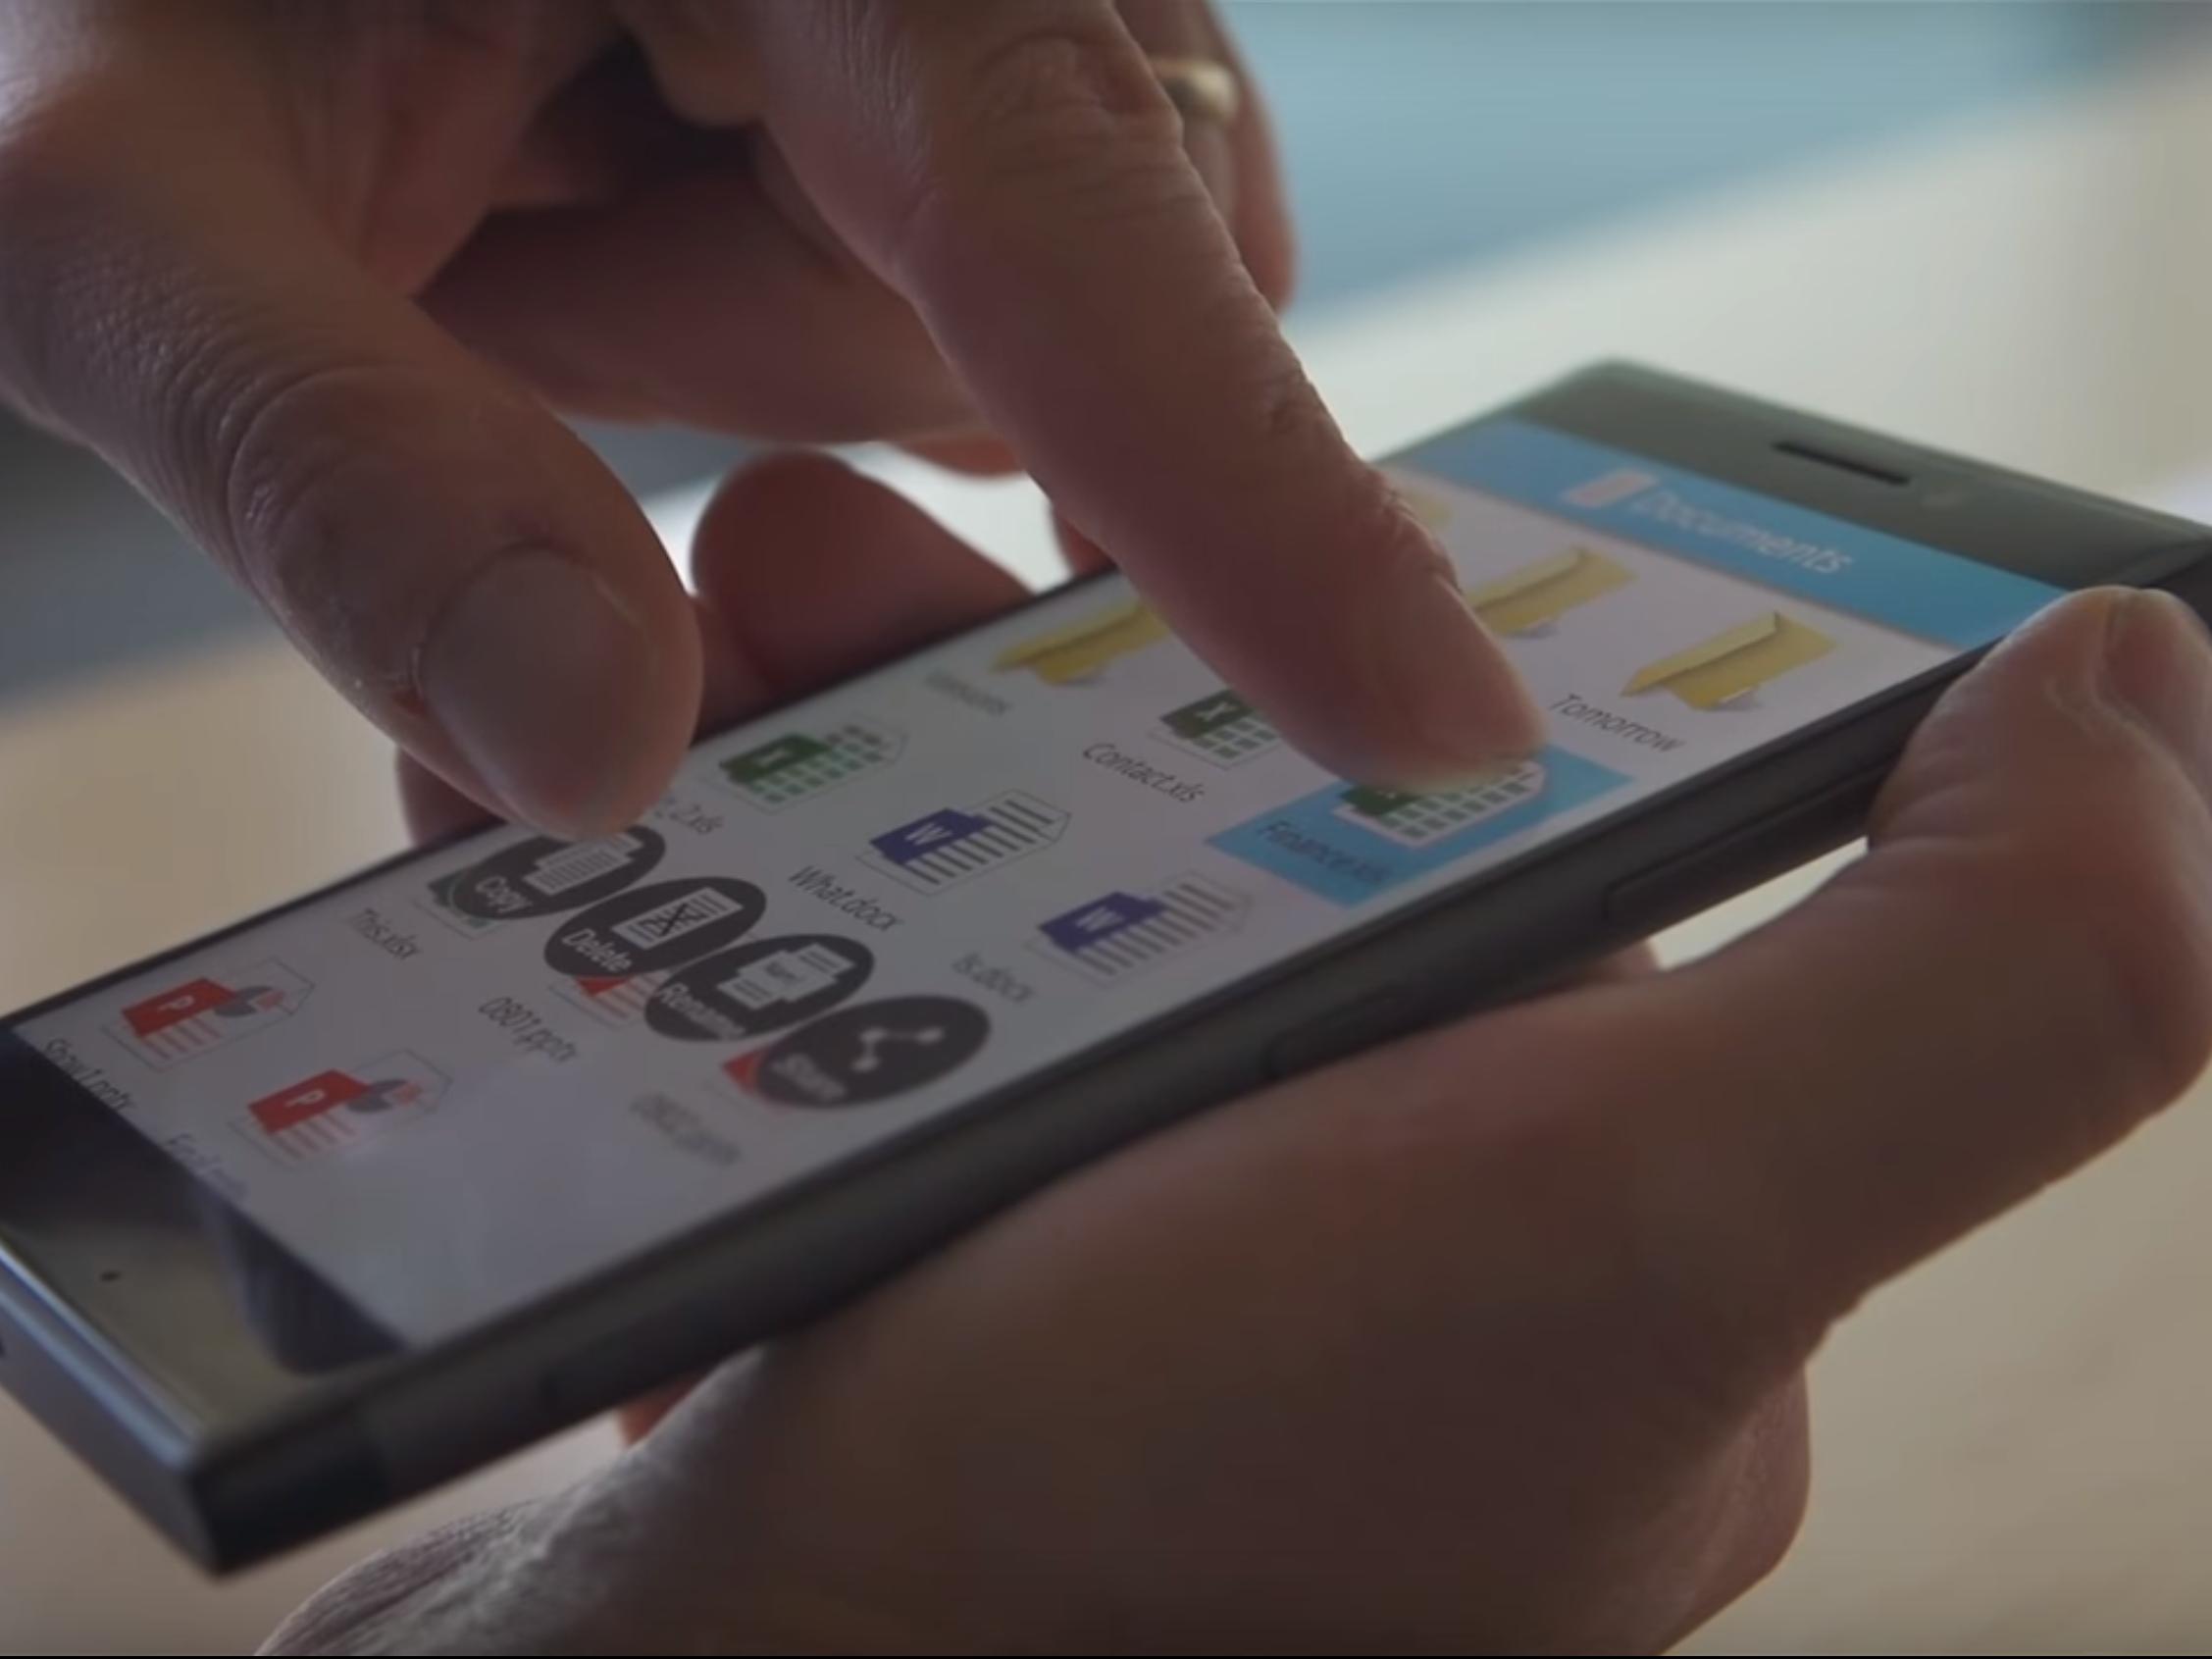 apple-should-definitely-copy-microsofts-incredible-finger-sensing-smartphone-technology-1.jpg